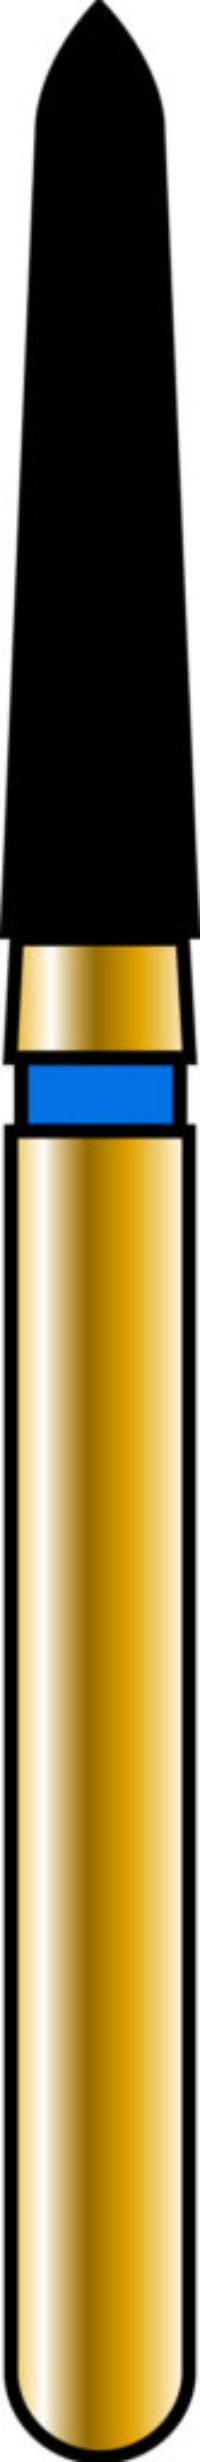 Pointed Taper 18-8mm Gold Diamond Bur